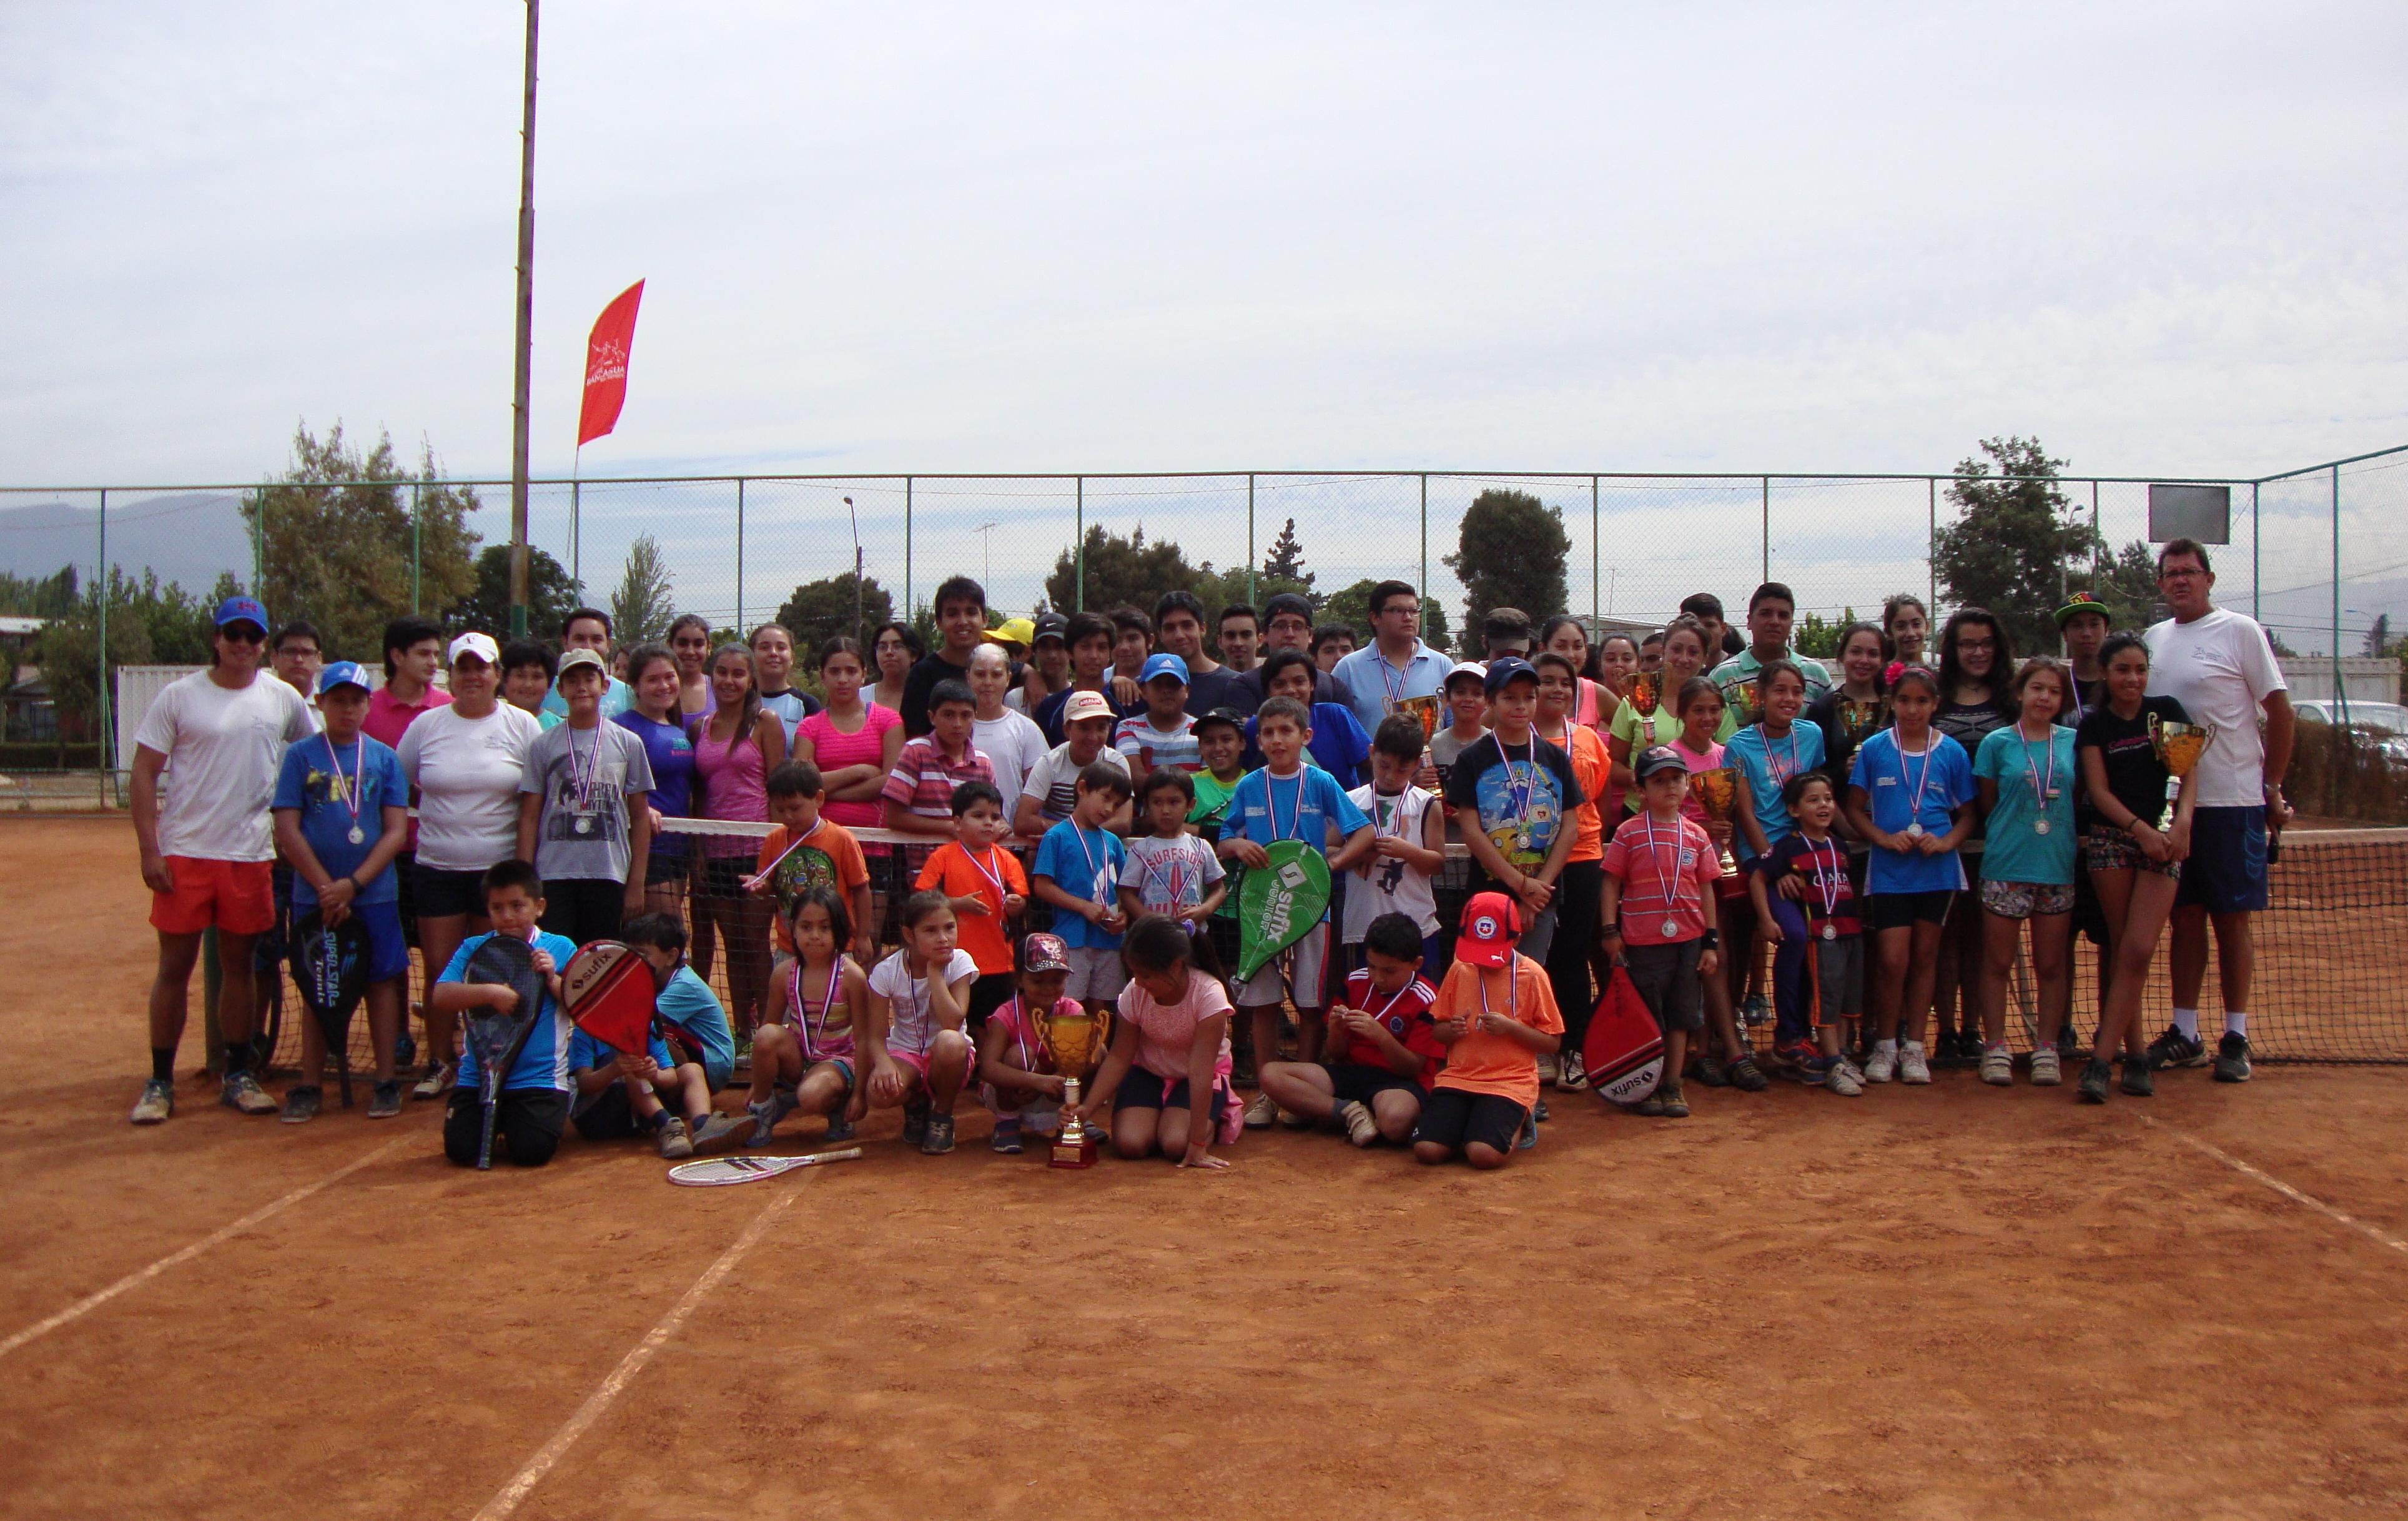 torneo de tenis rancagua